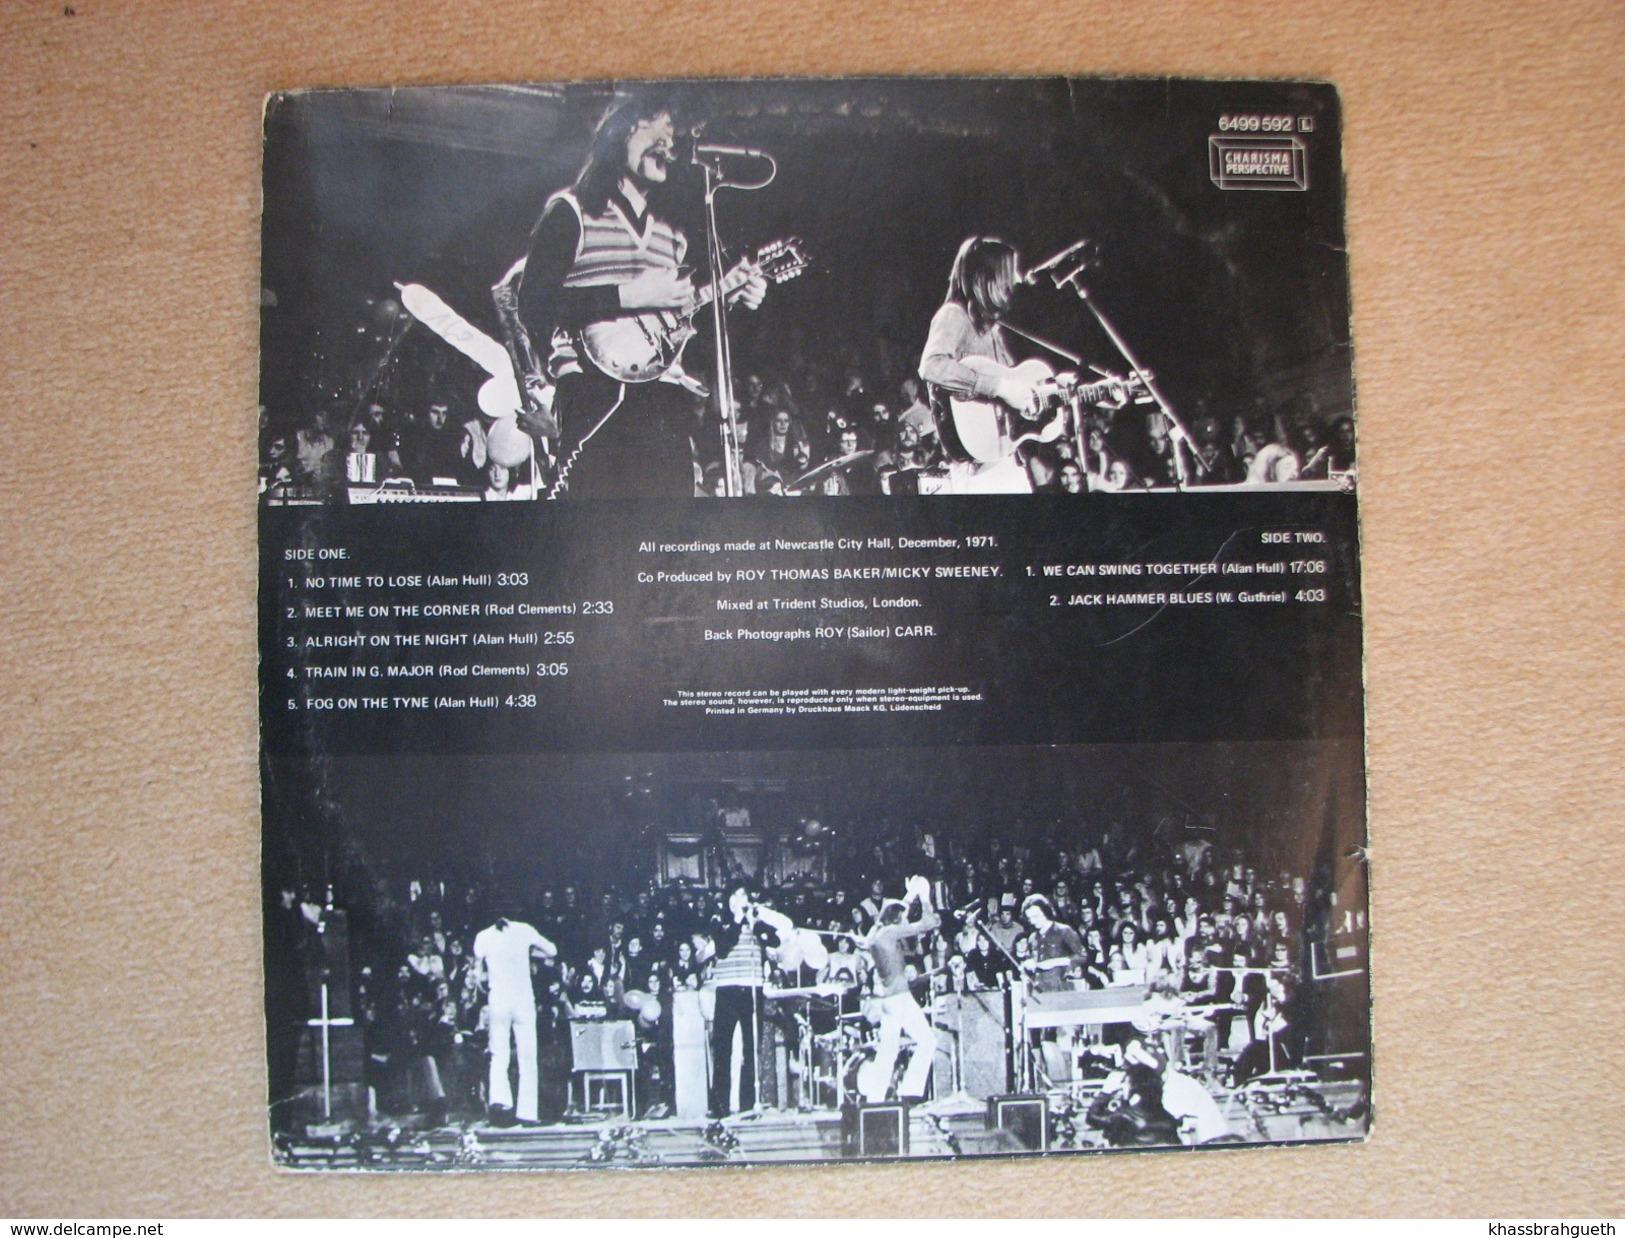 LINDISFARNE - LIVE (LP) (CHARISMA LABEL 1971) - Rock